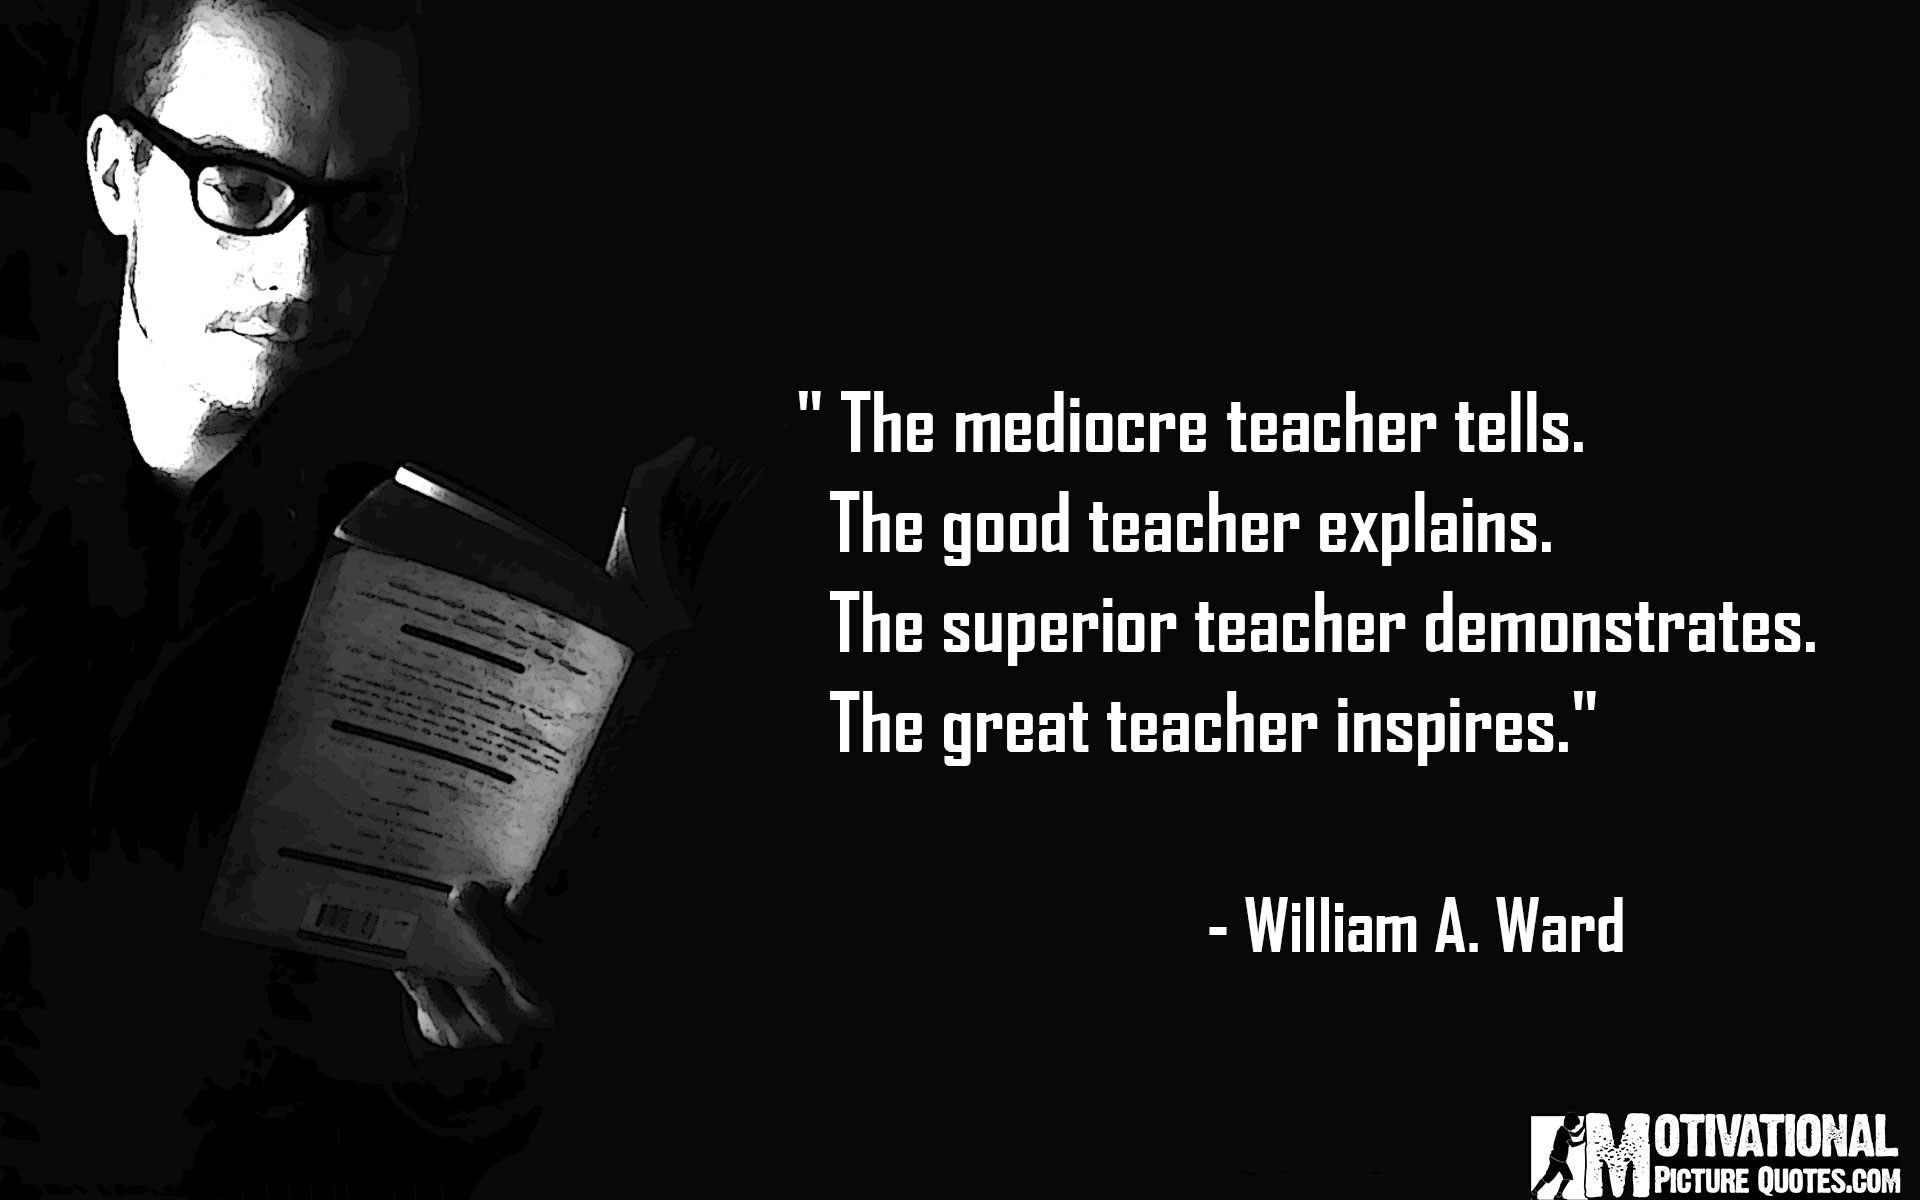 Teacher Quotes: 10+ Inspirational Teacher Quotes Images